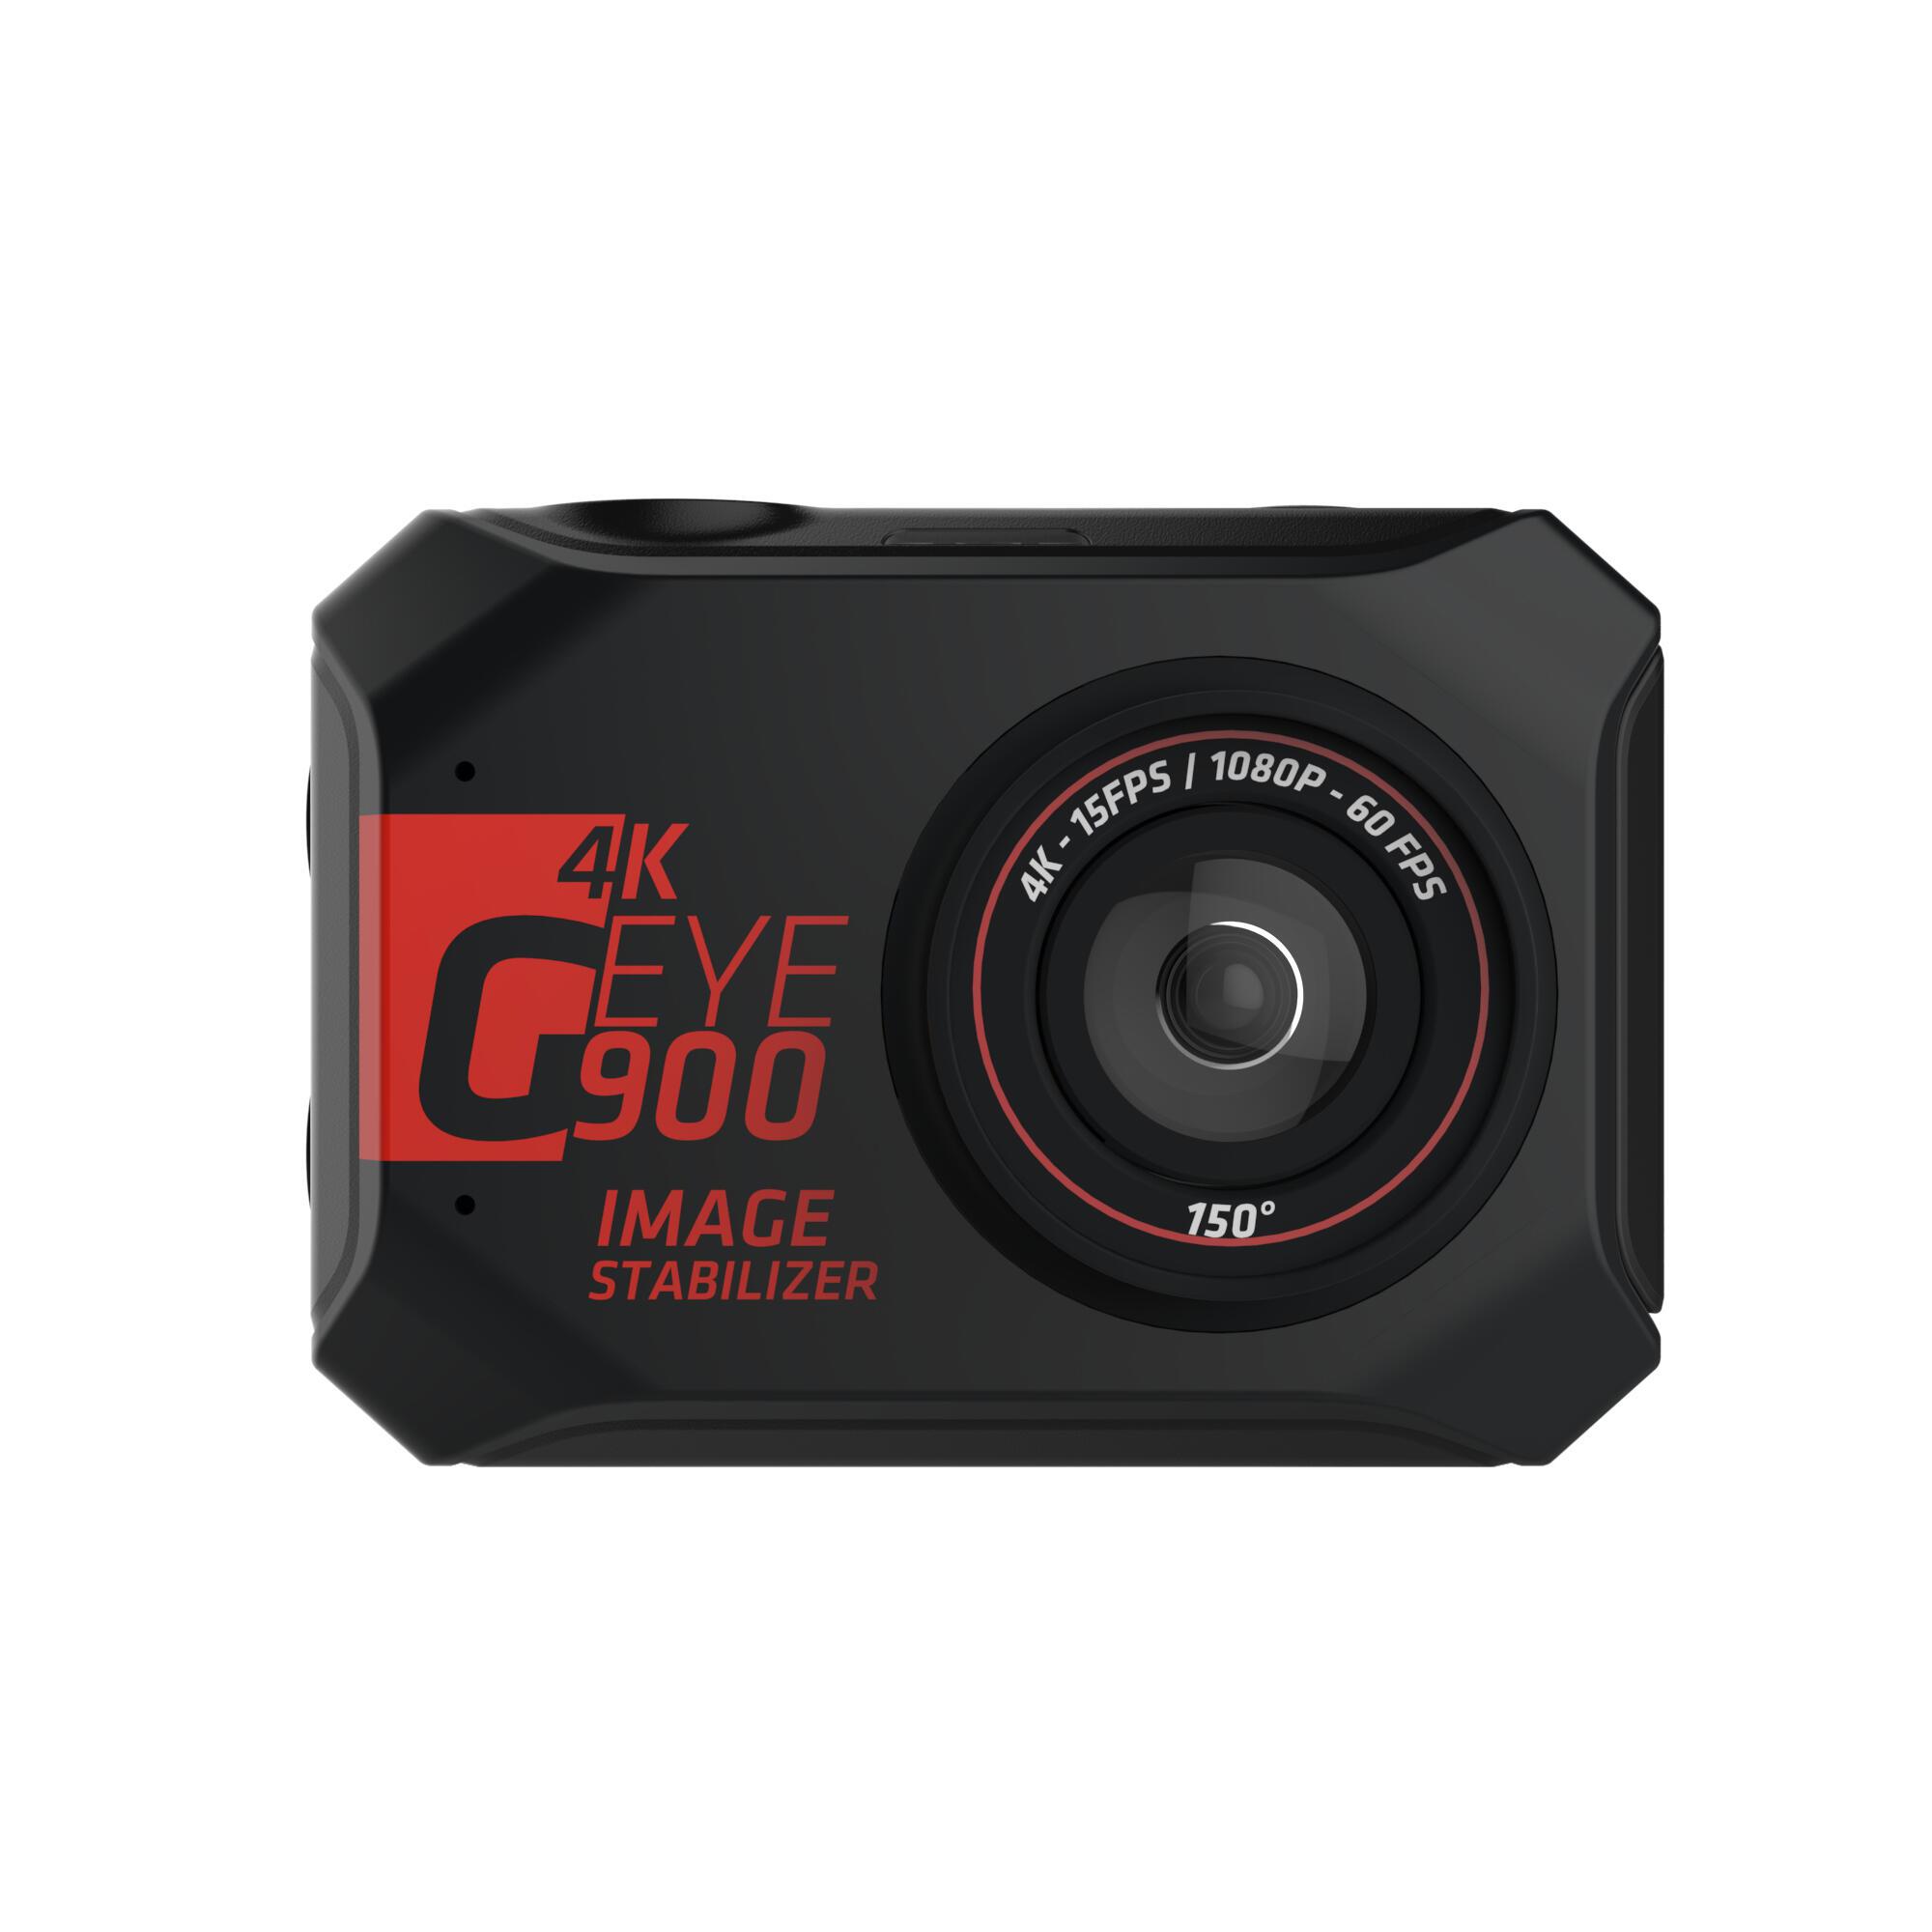 Cámara deportiva G-EYE 900 4K y FULL HD con pantalla táctil.